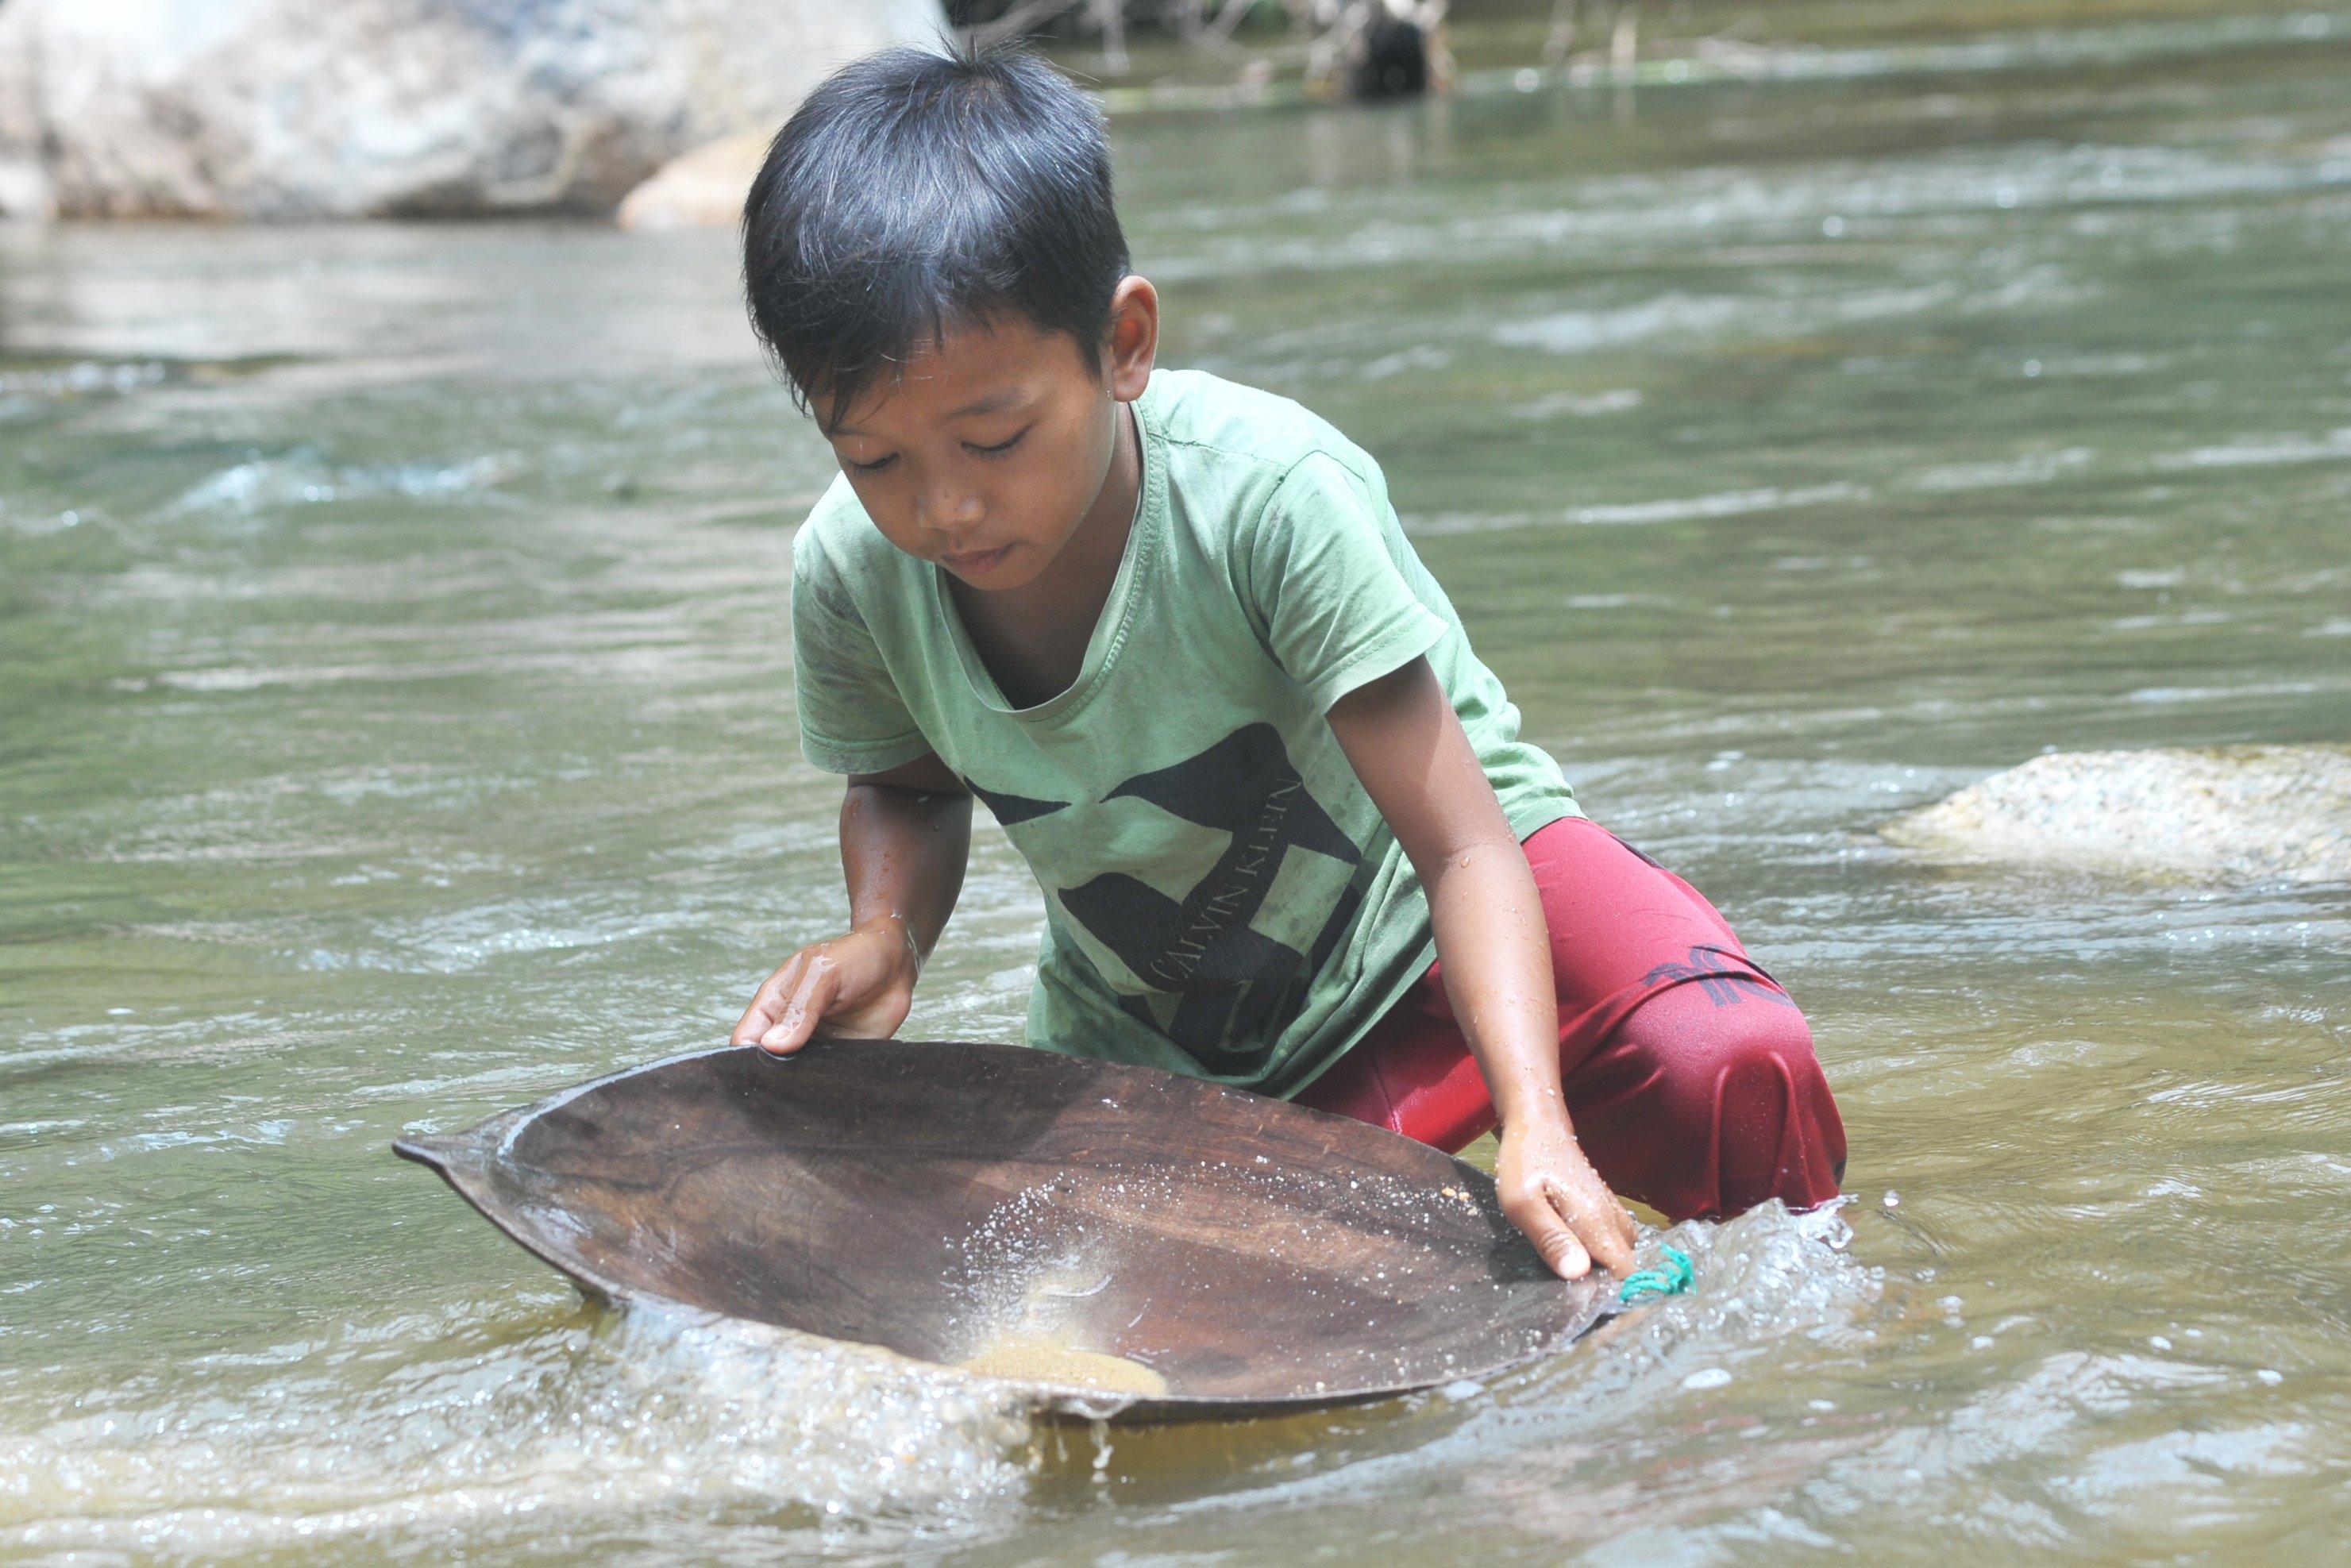 Anak-anak pun ikut serta mendulang emas di sungai itu. Anak-anak biasanya mendulang sepulang sekolah sambil bermain atau mandi-mandi.